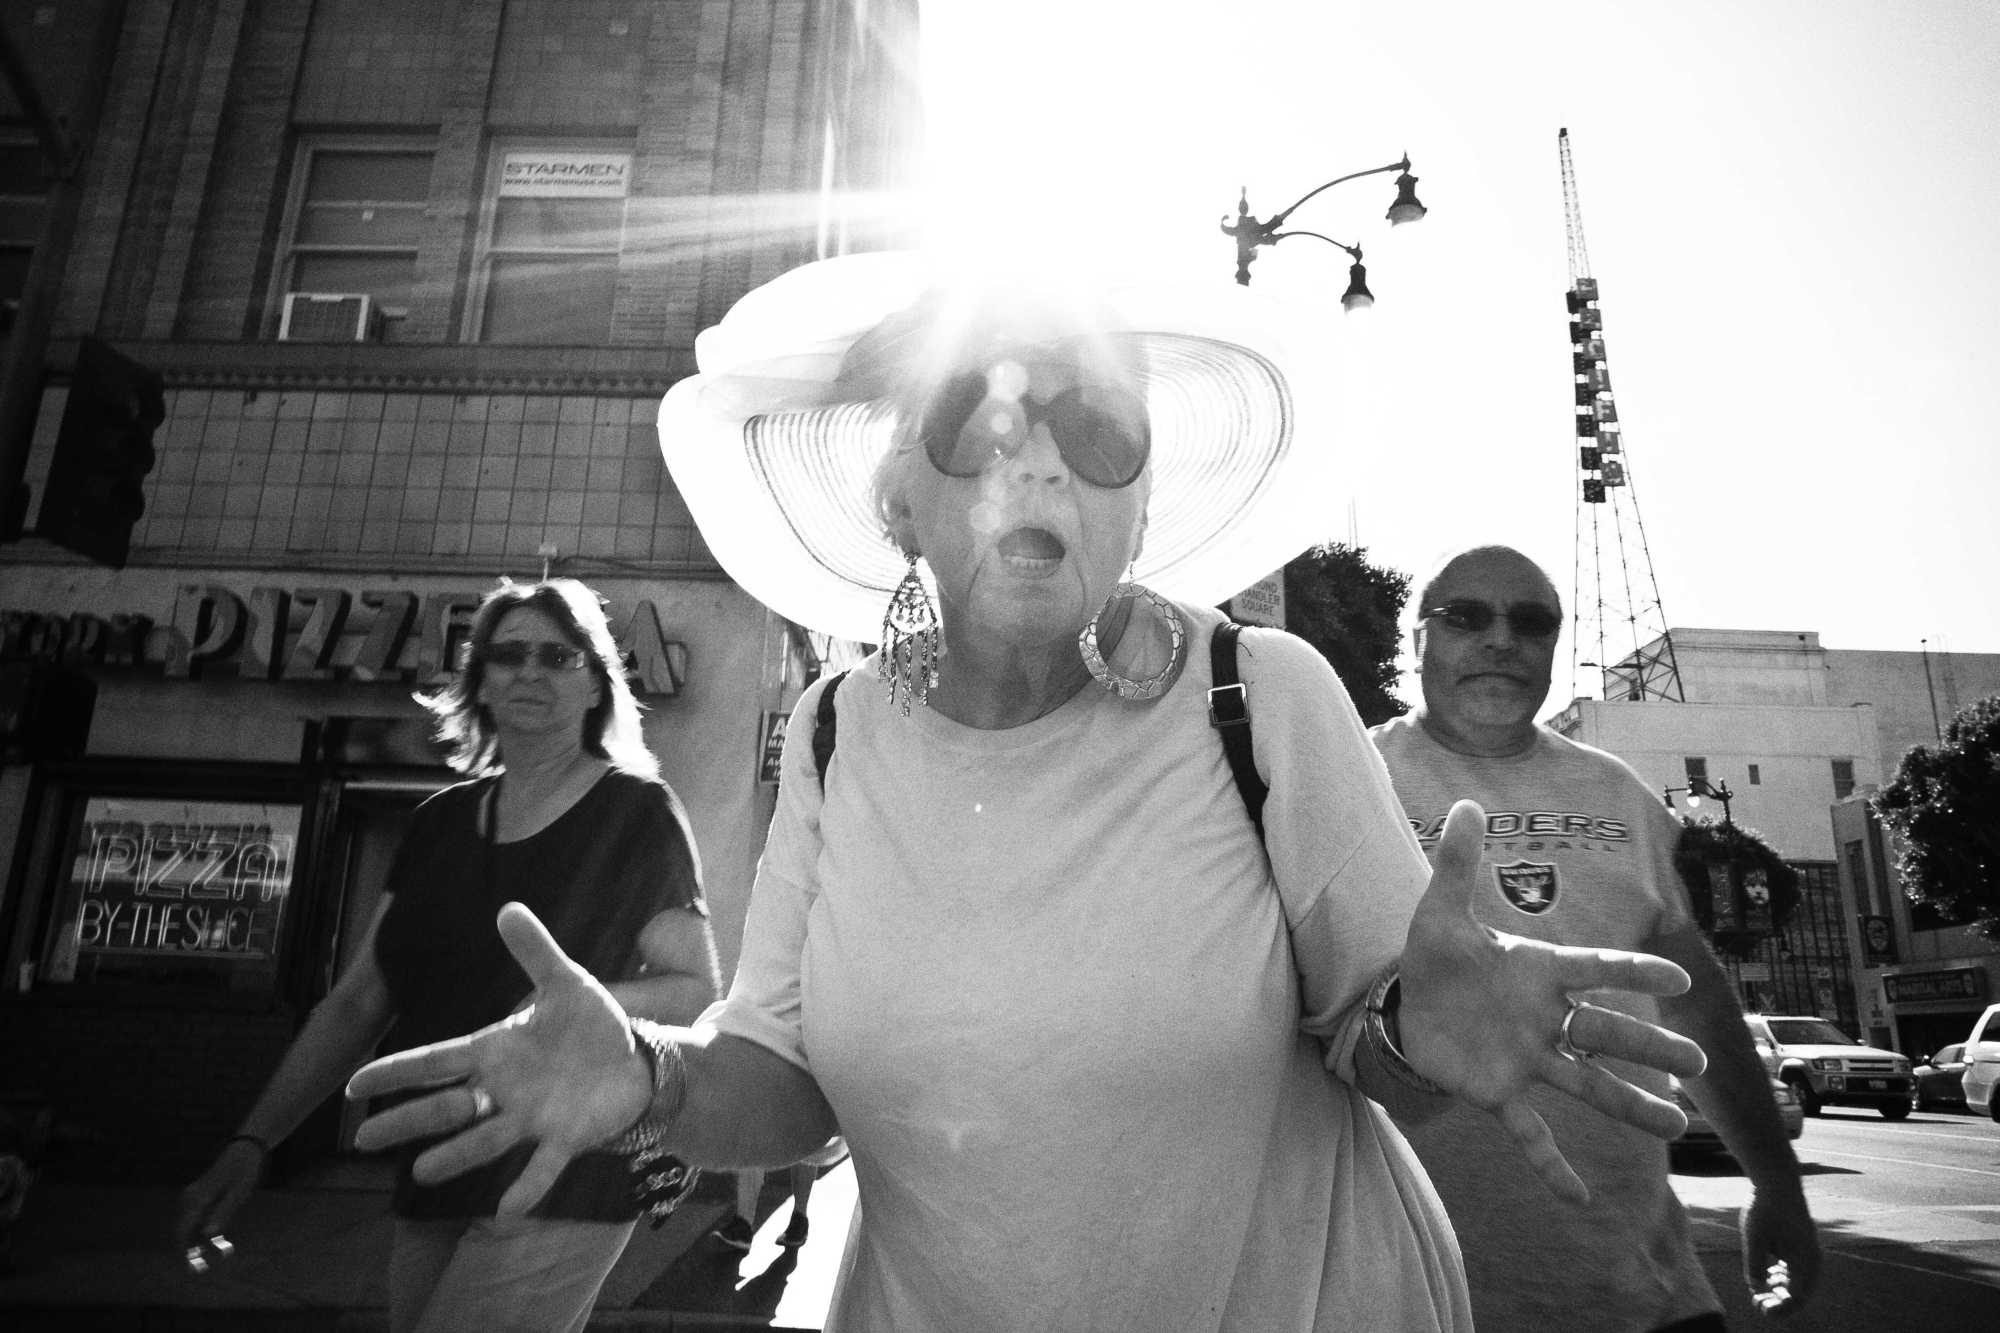 Street Photography Ideas